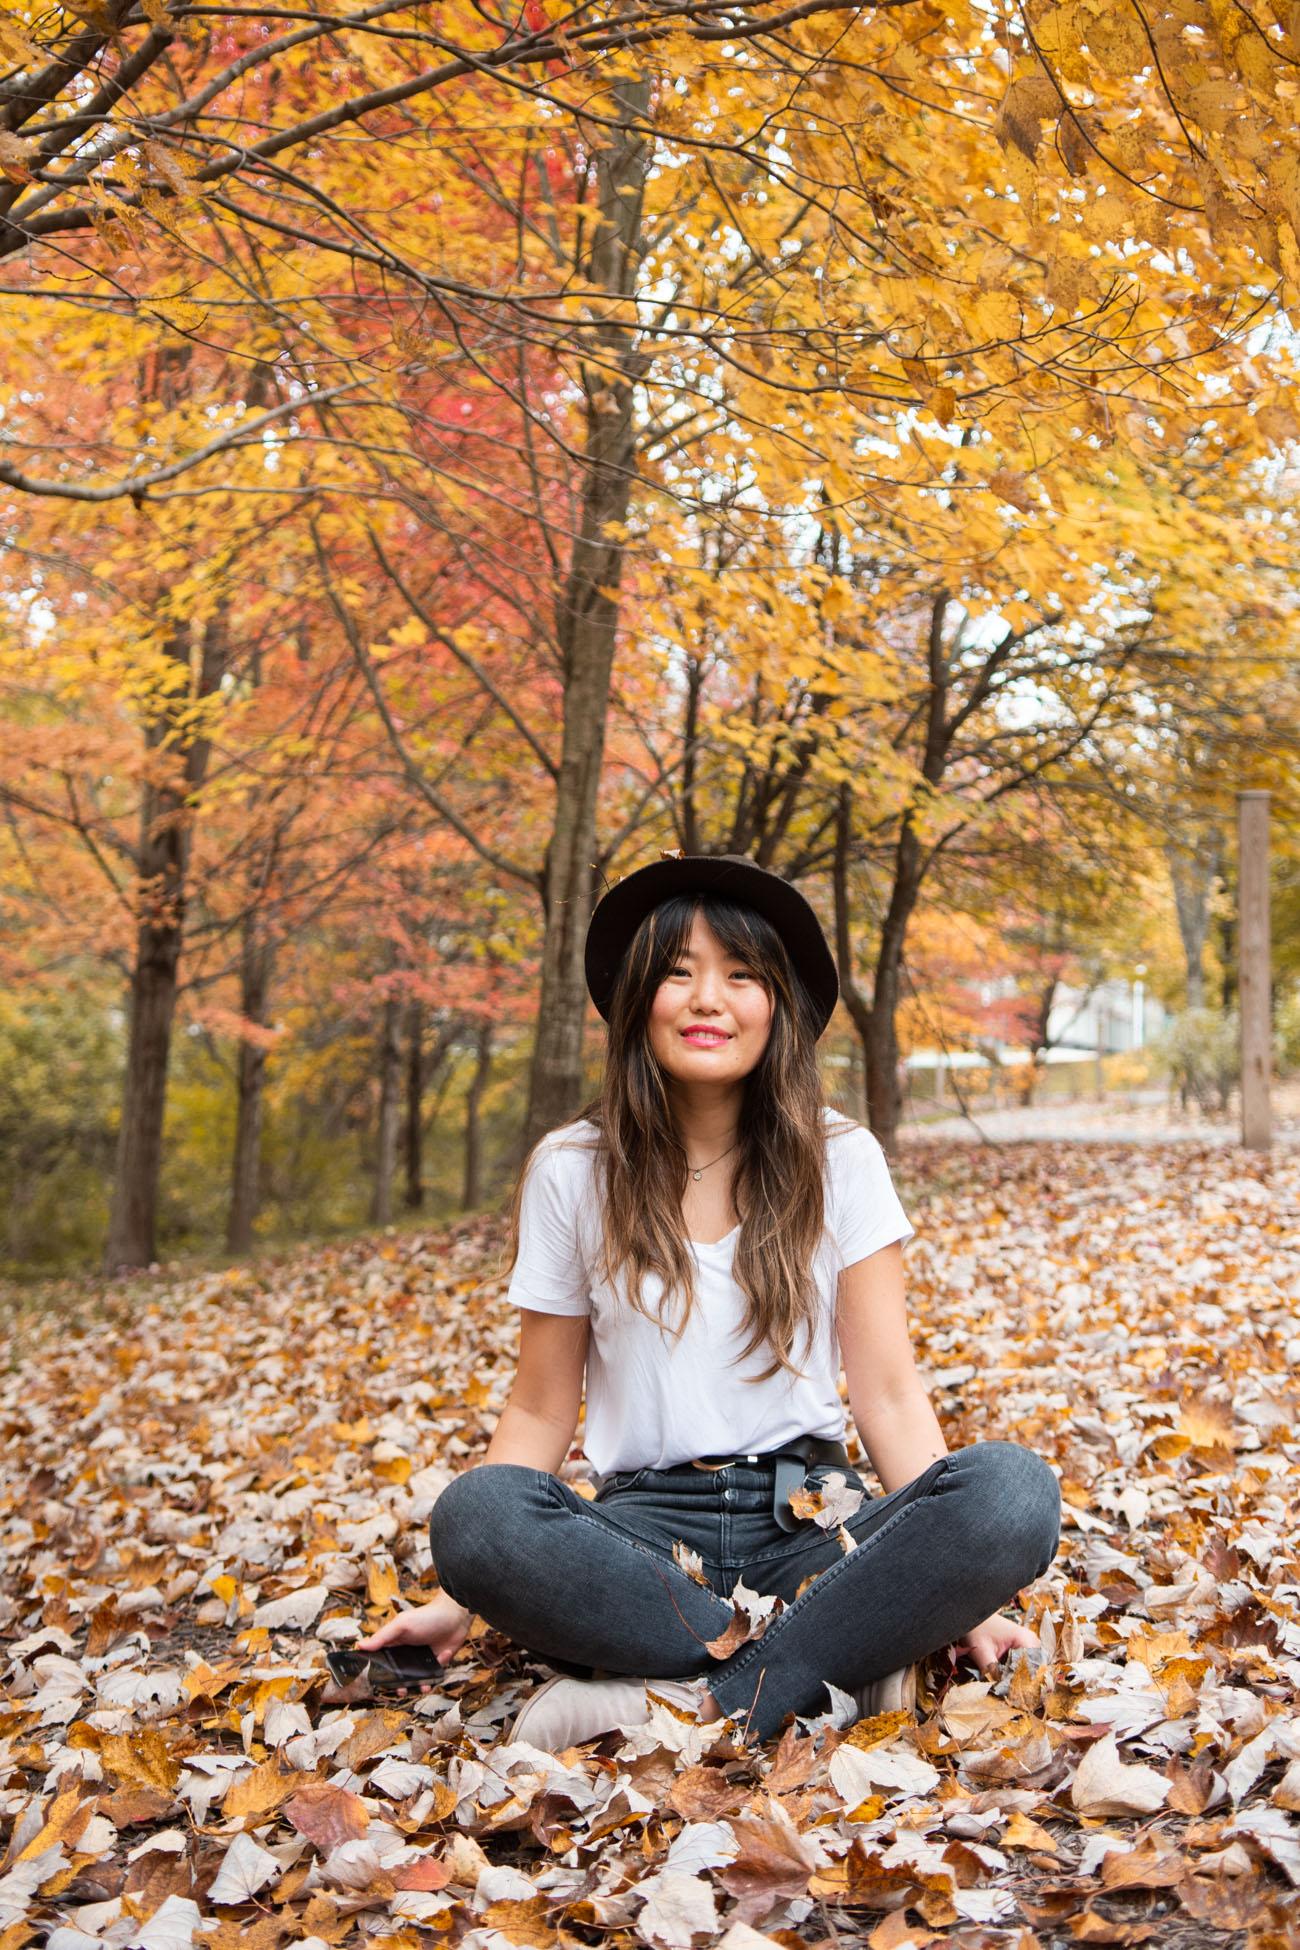 fall color 2019 washington dc